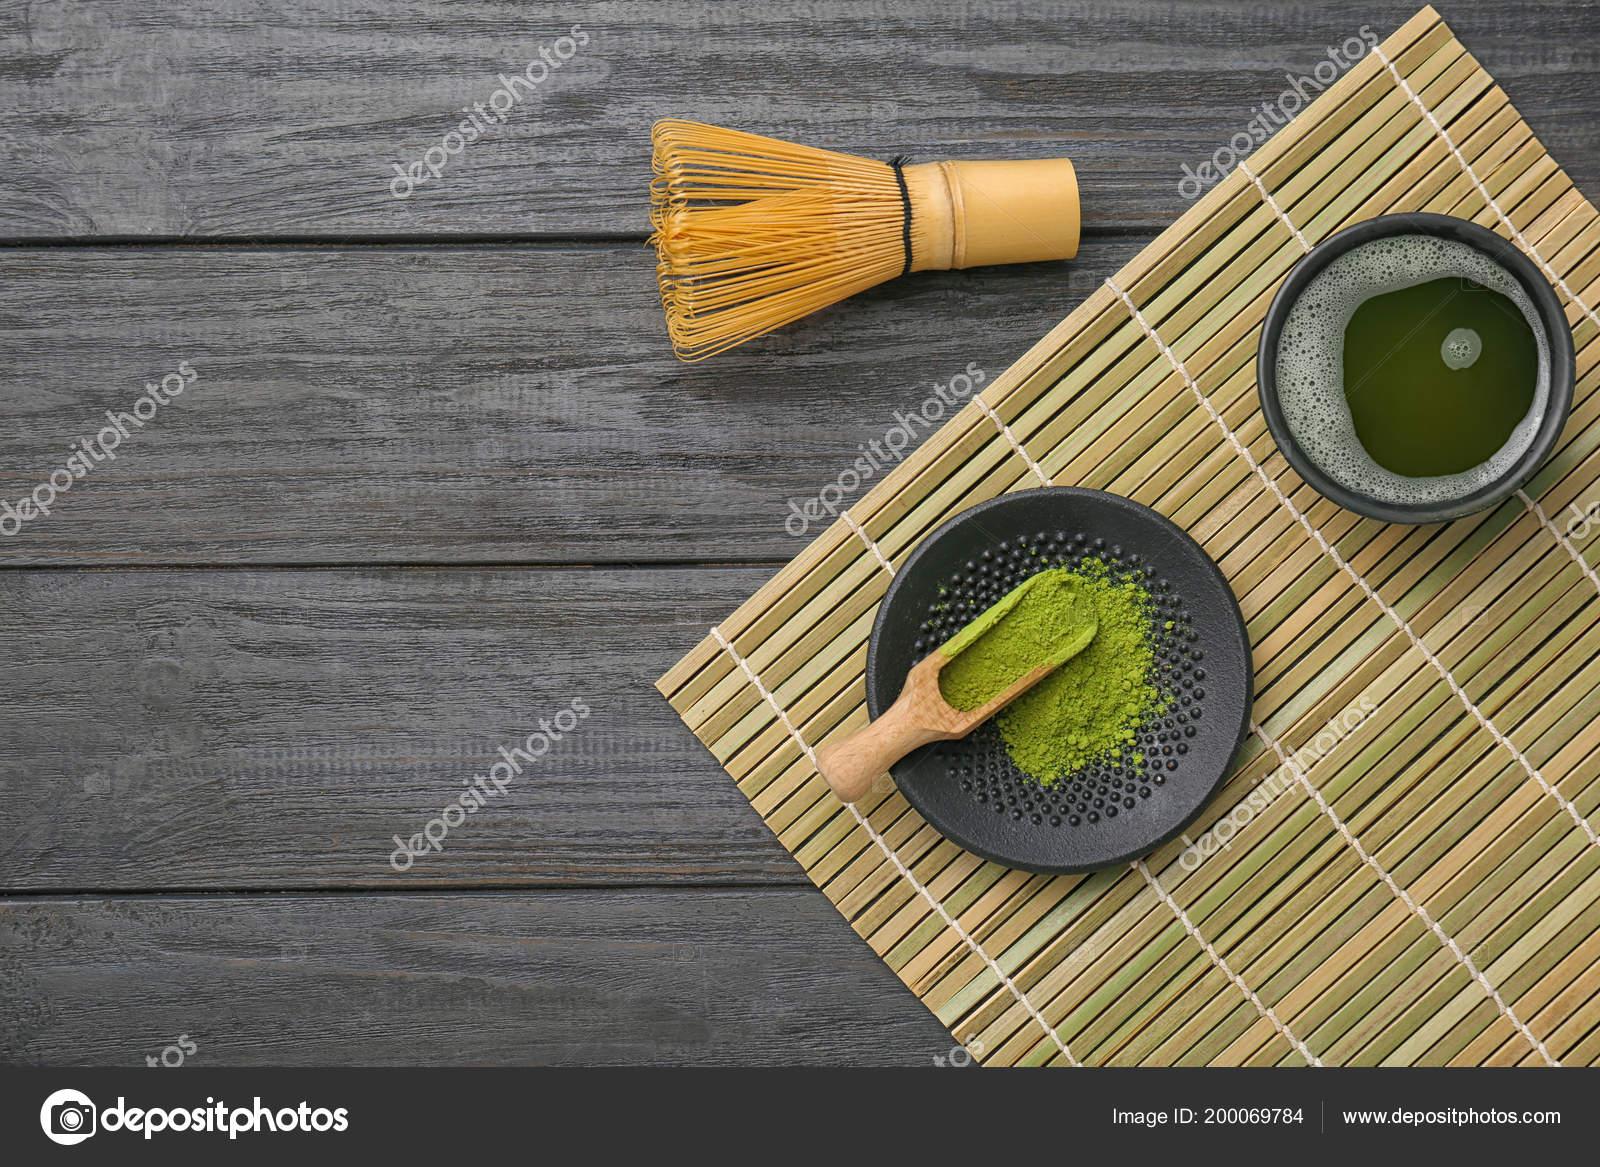 Composition of tea